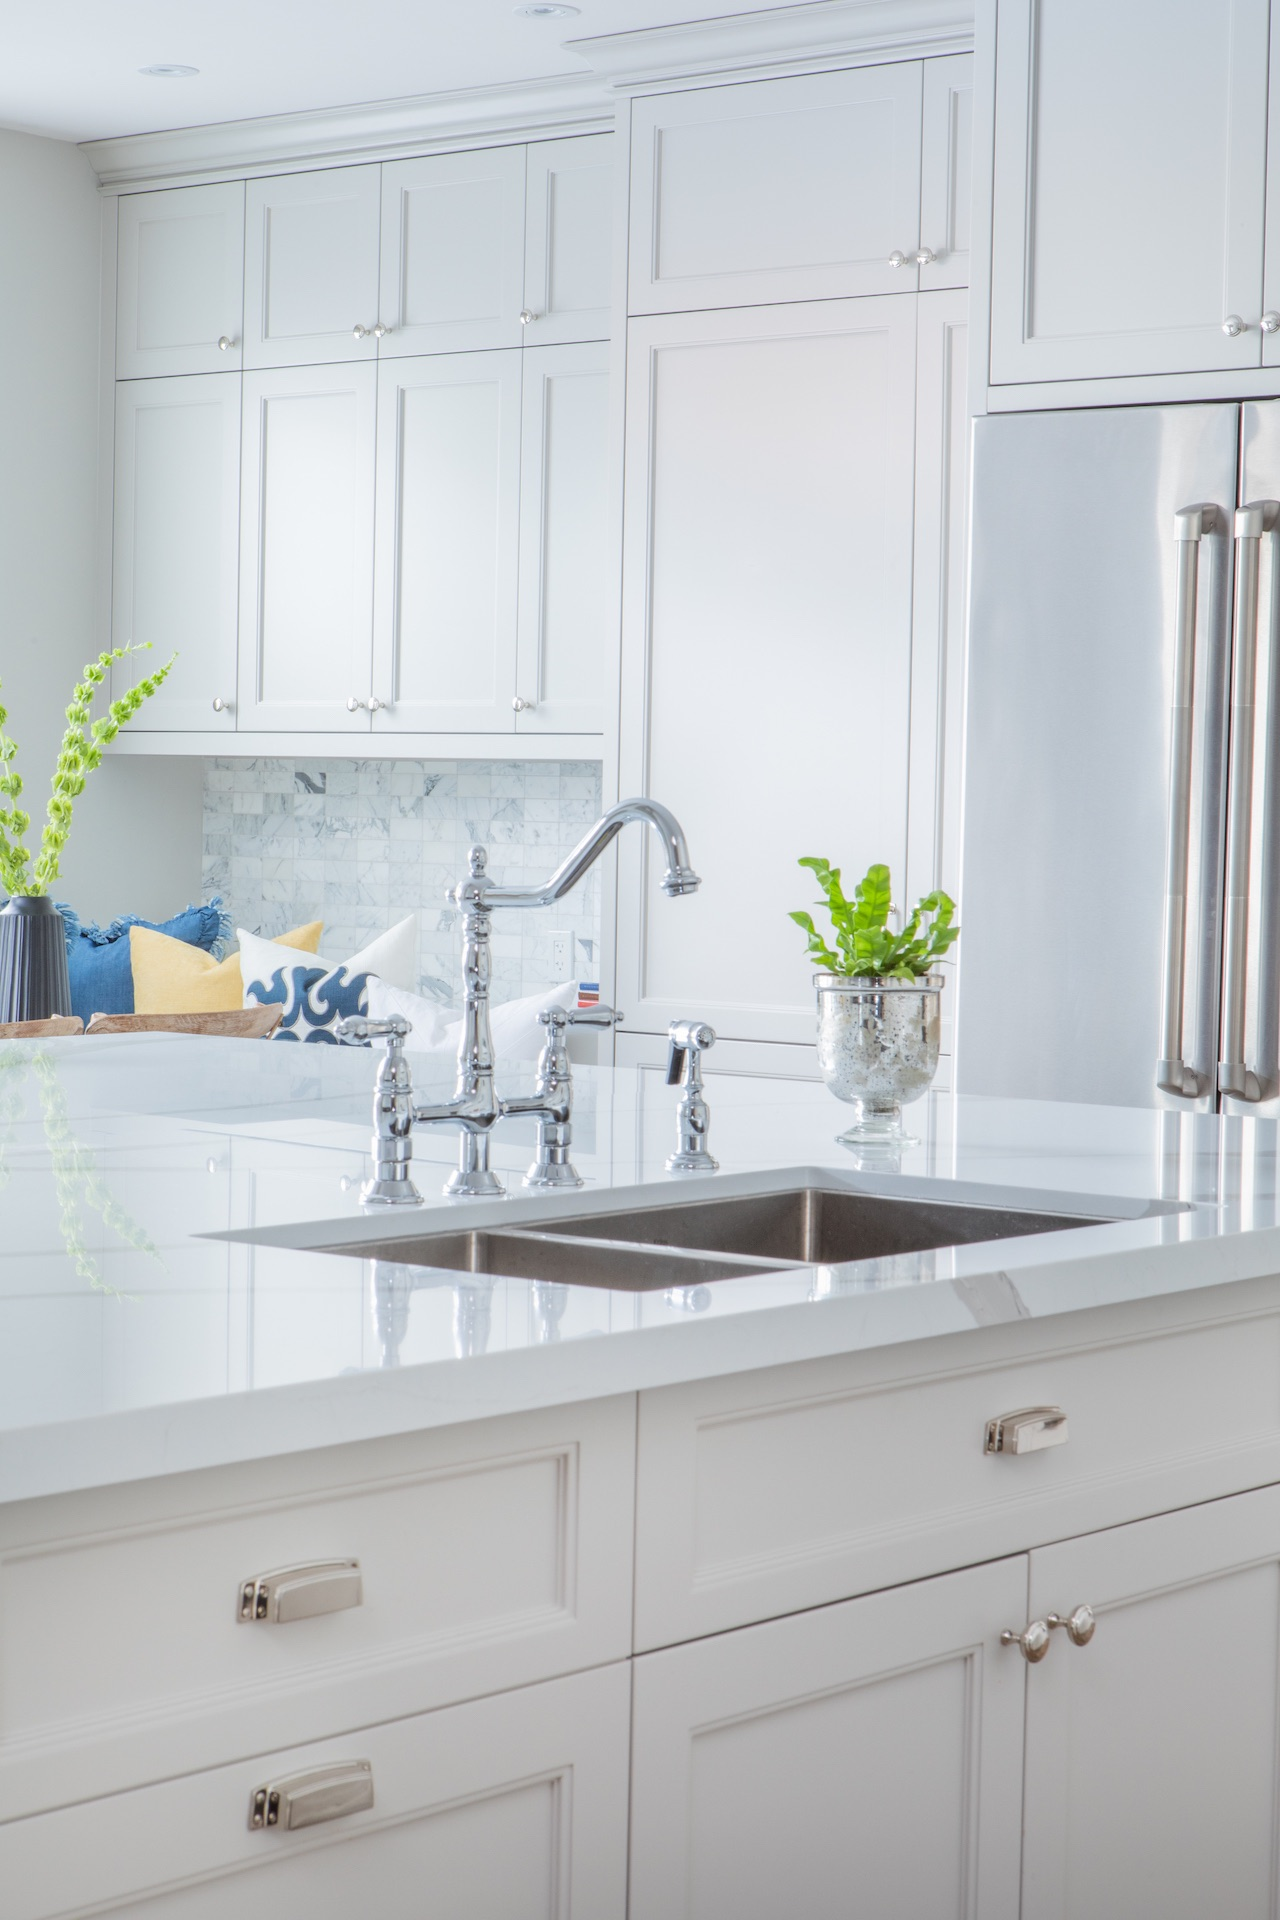 white kitchen with silver sink